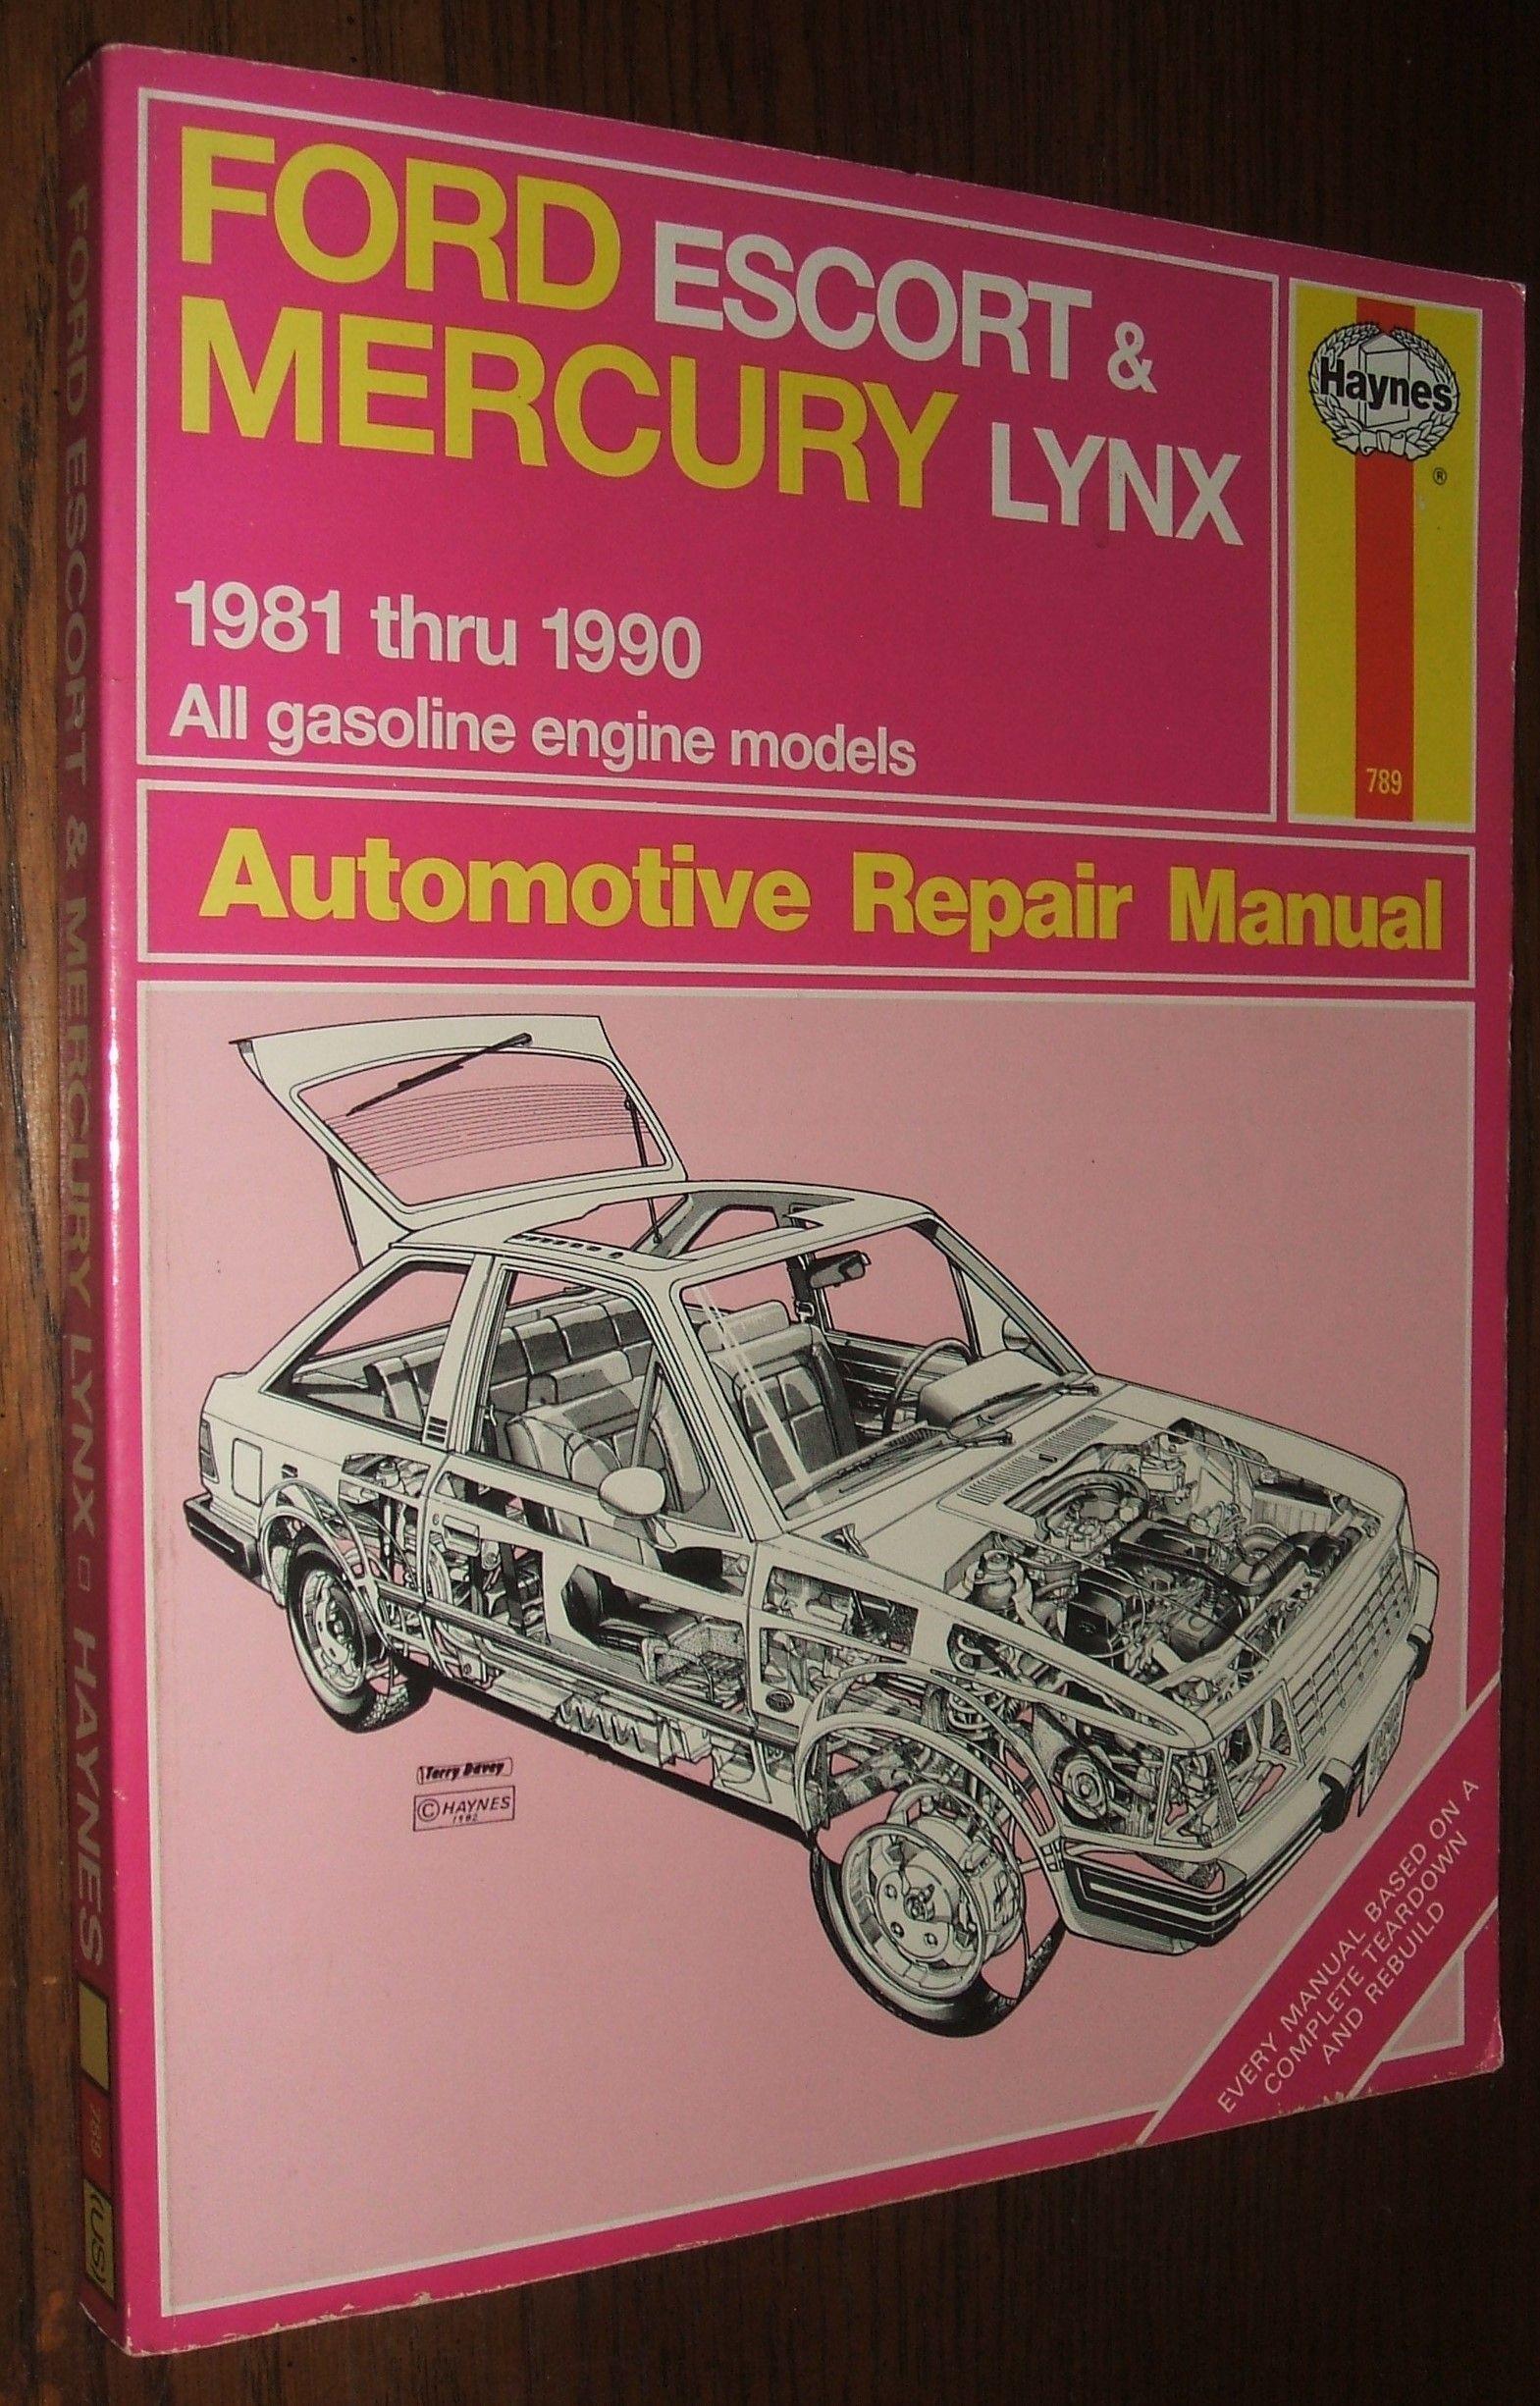 ford escort and mercury lynx automotive repair manual 1981 1990 by alan  ahlstrand - - Biblio.com